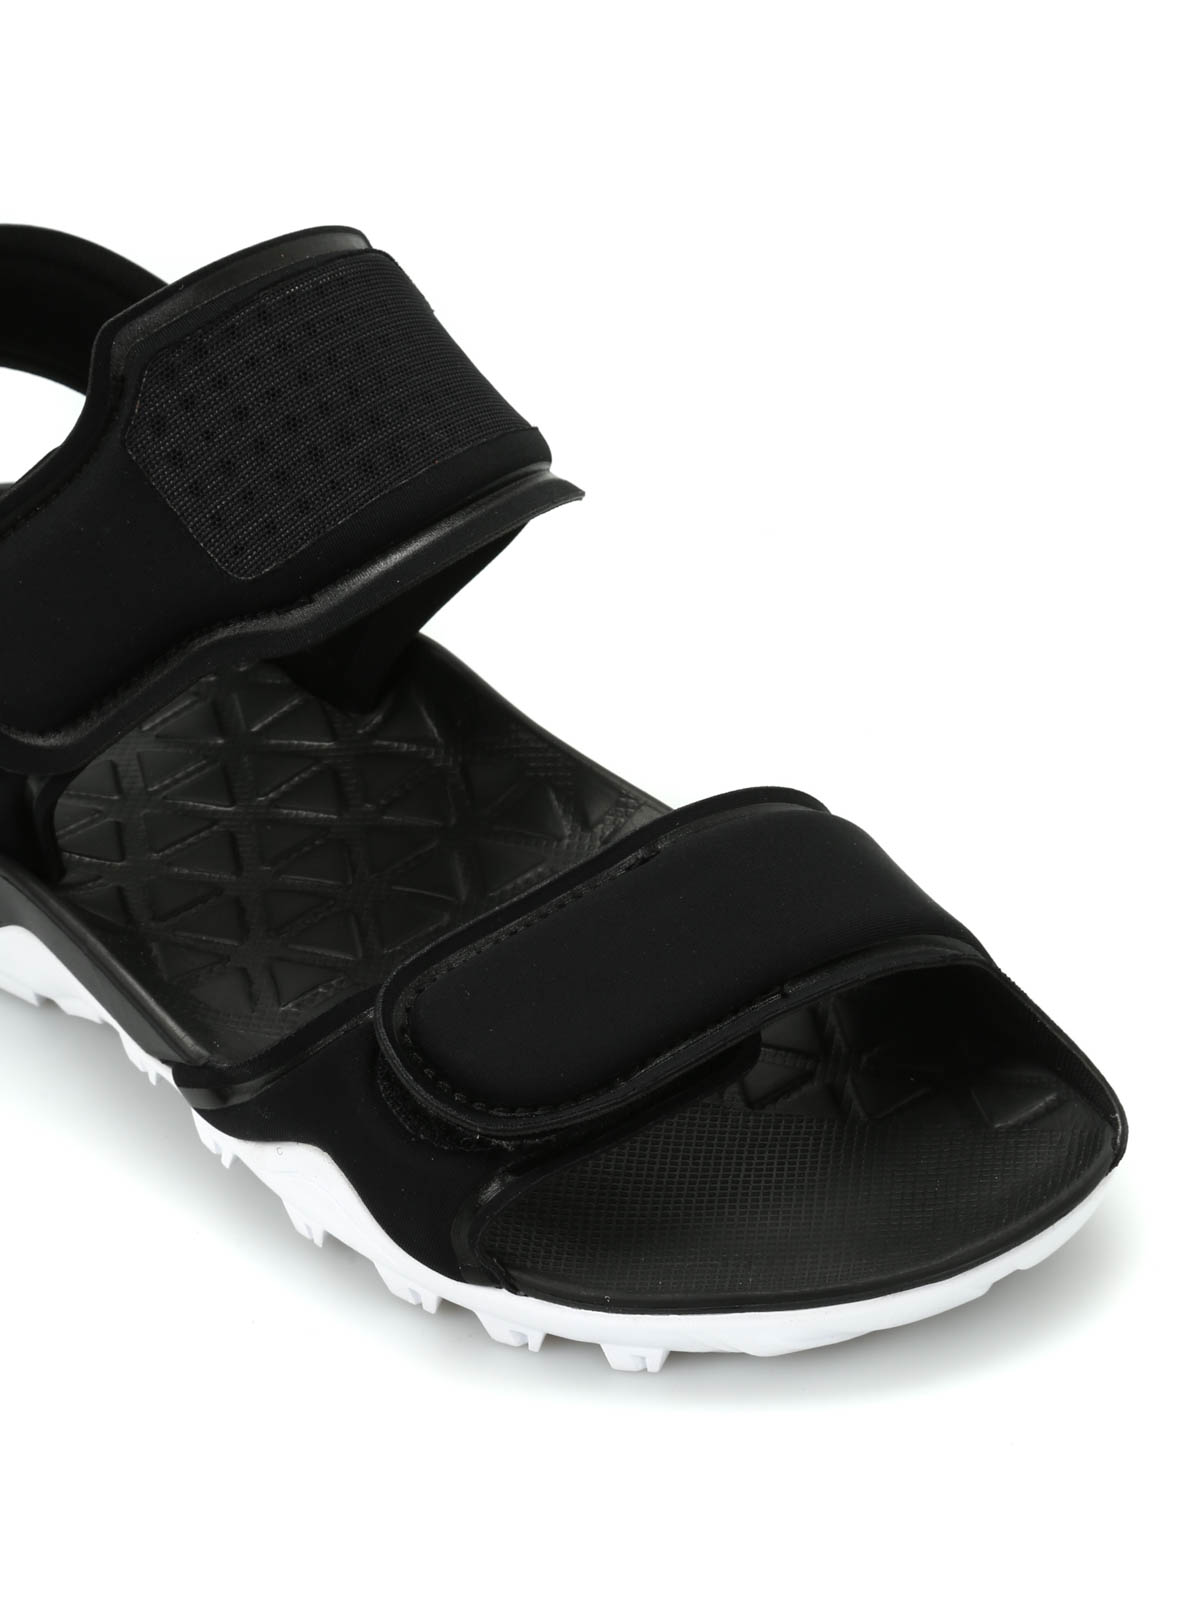 e152390cdb4d44 Adidas by Stella McCartney - Hikara sport sandals - sandals - S78410 ...